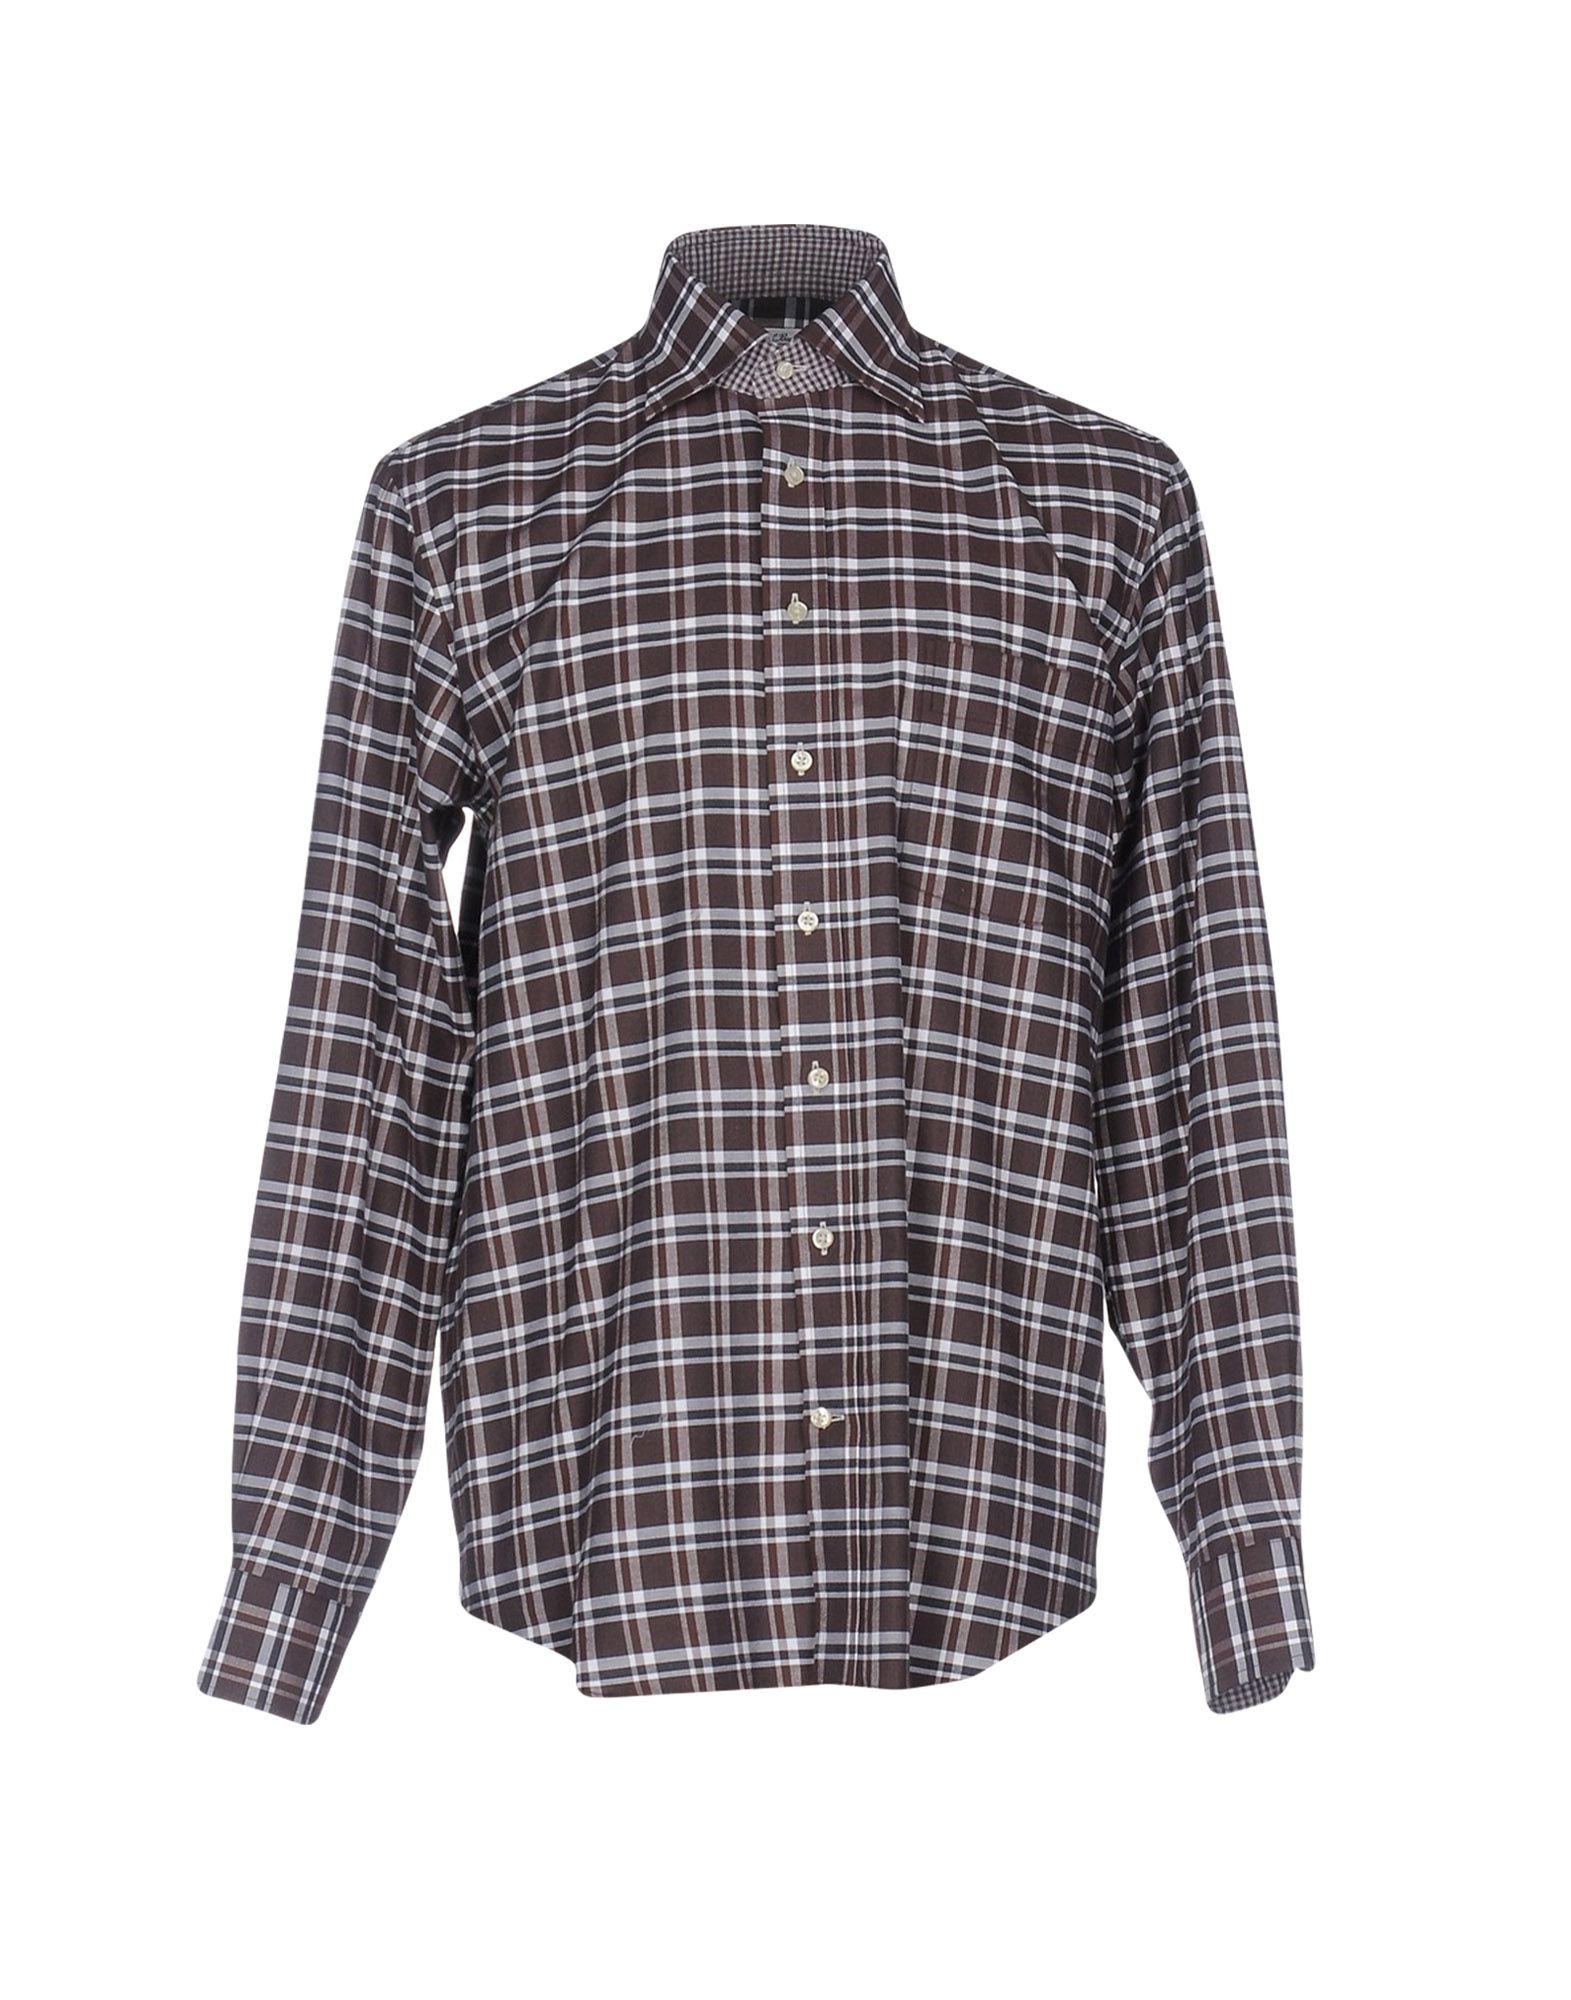 EMANUEL BERG Checked Shirt in Dark Brown